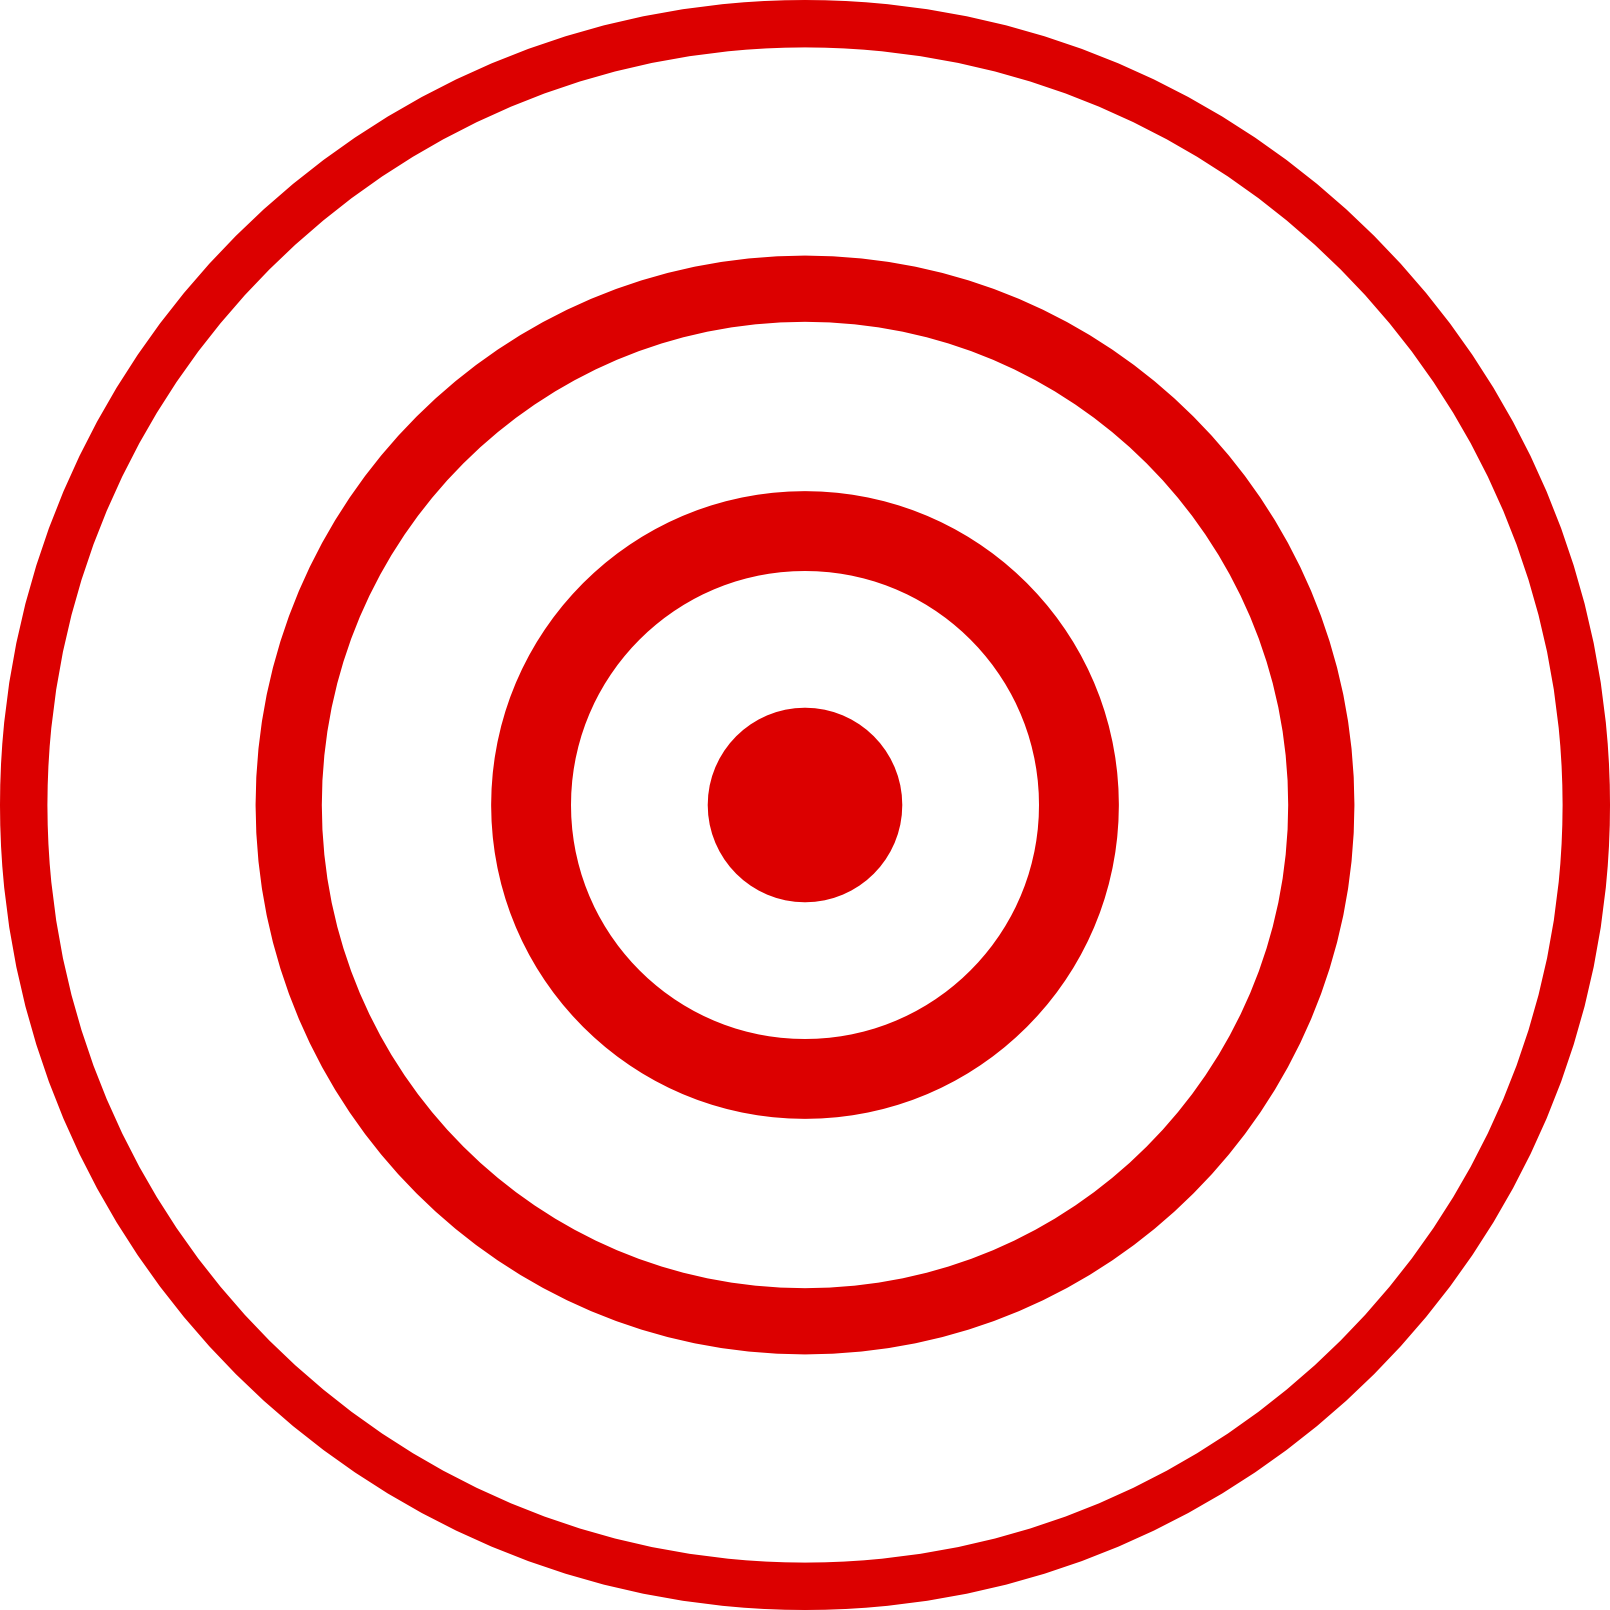 Free Bullseye Clipart Image.